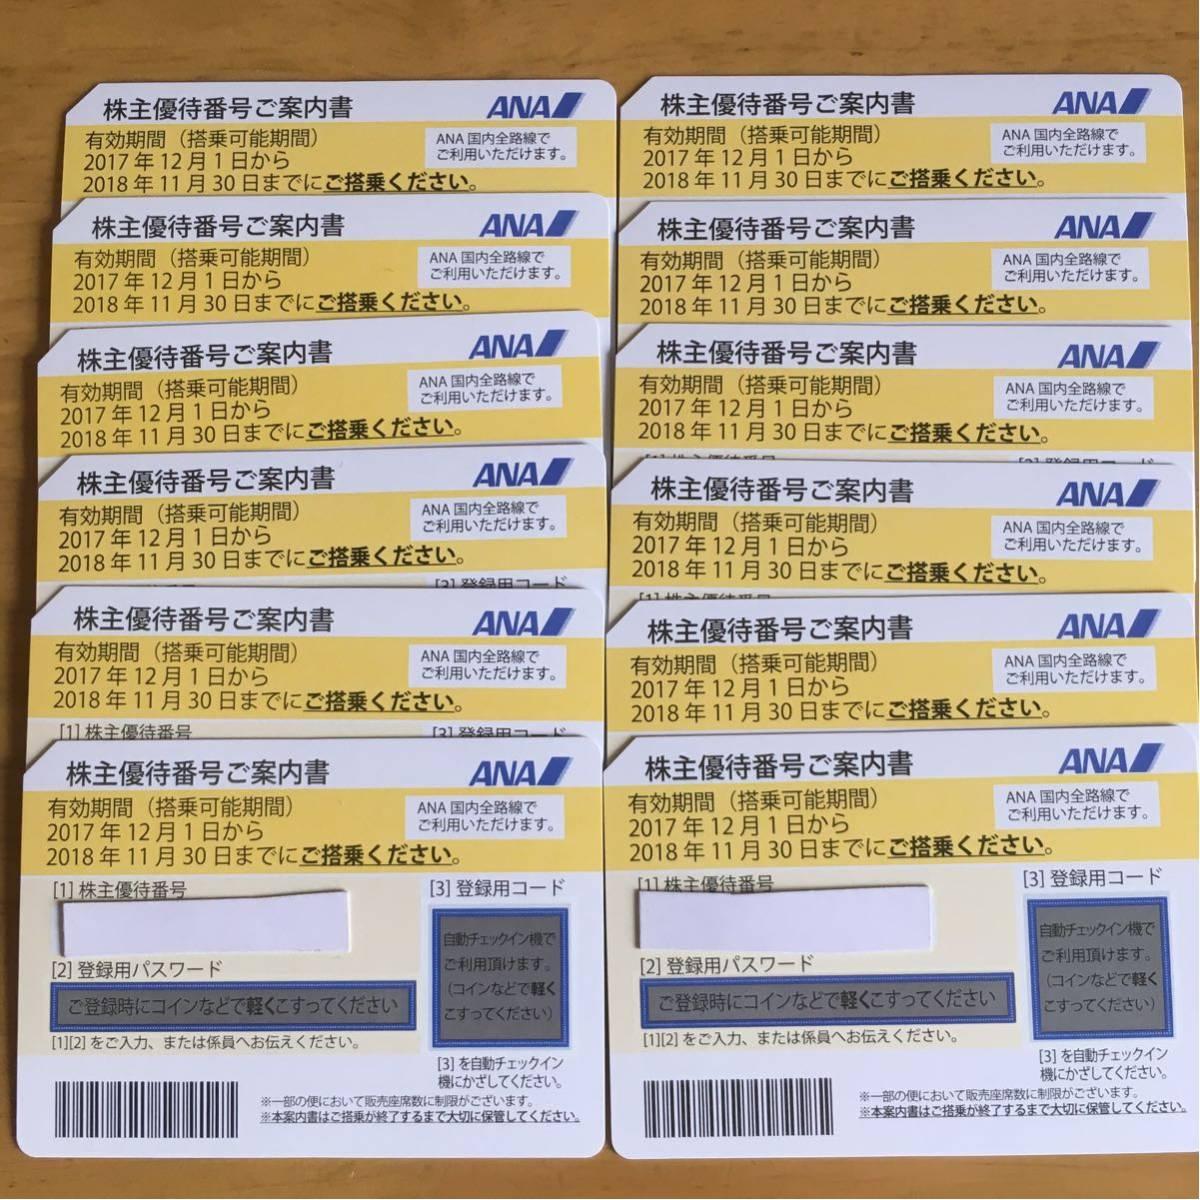 【送料無料】ANA株主優待券12枚セット 2018年11月30日期限